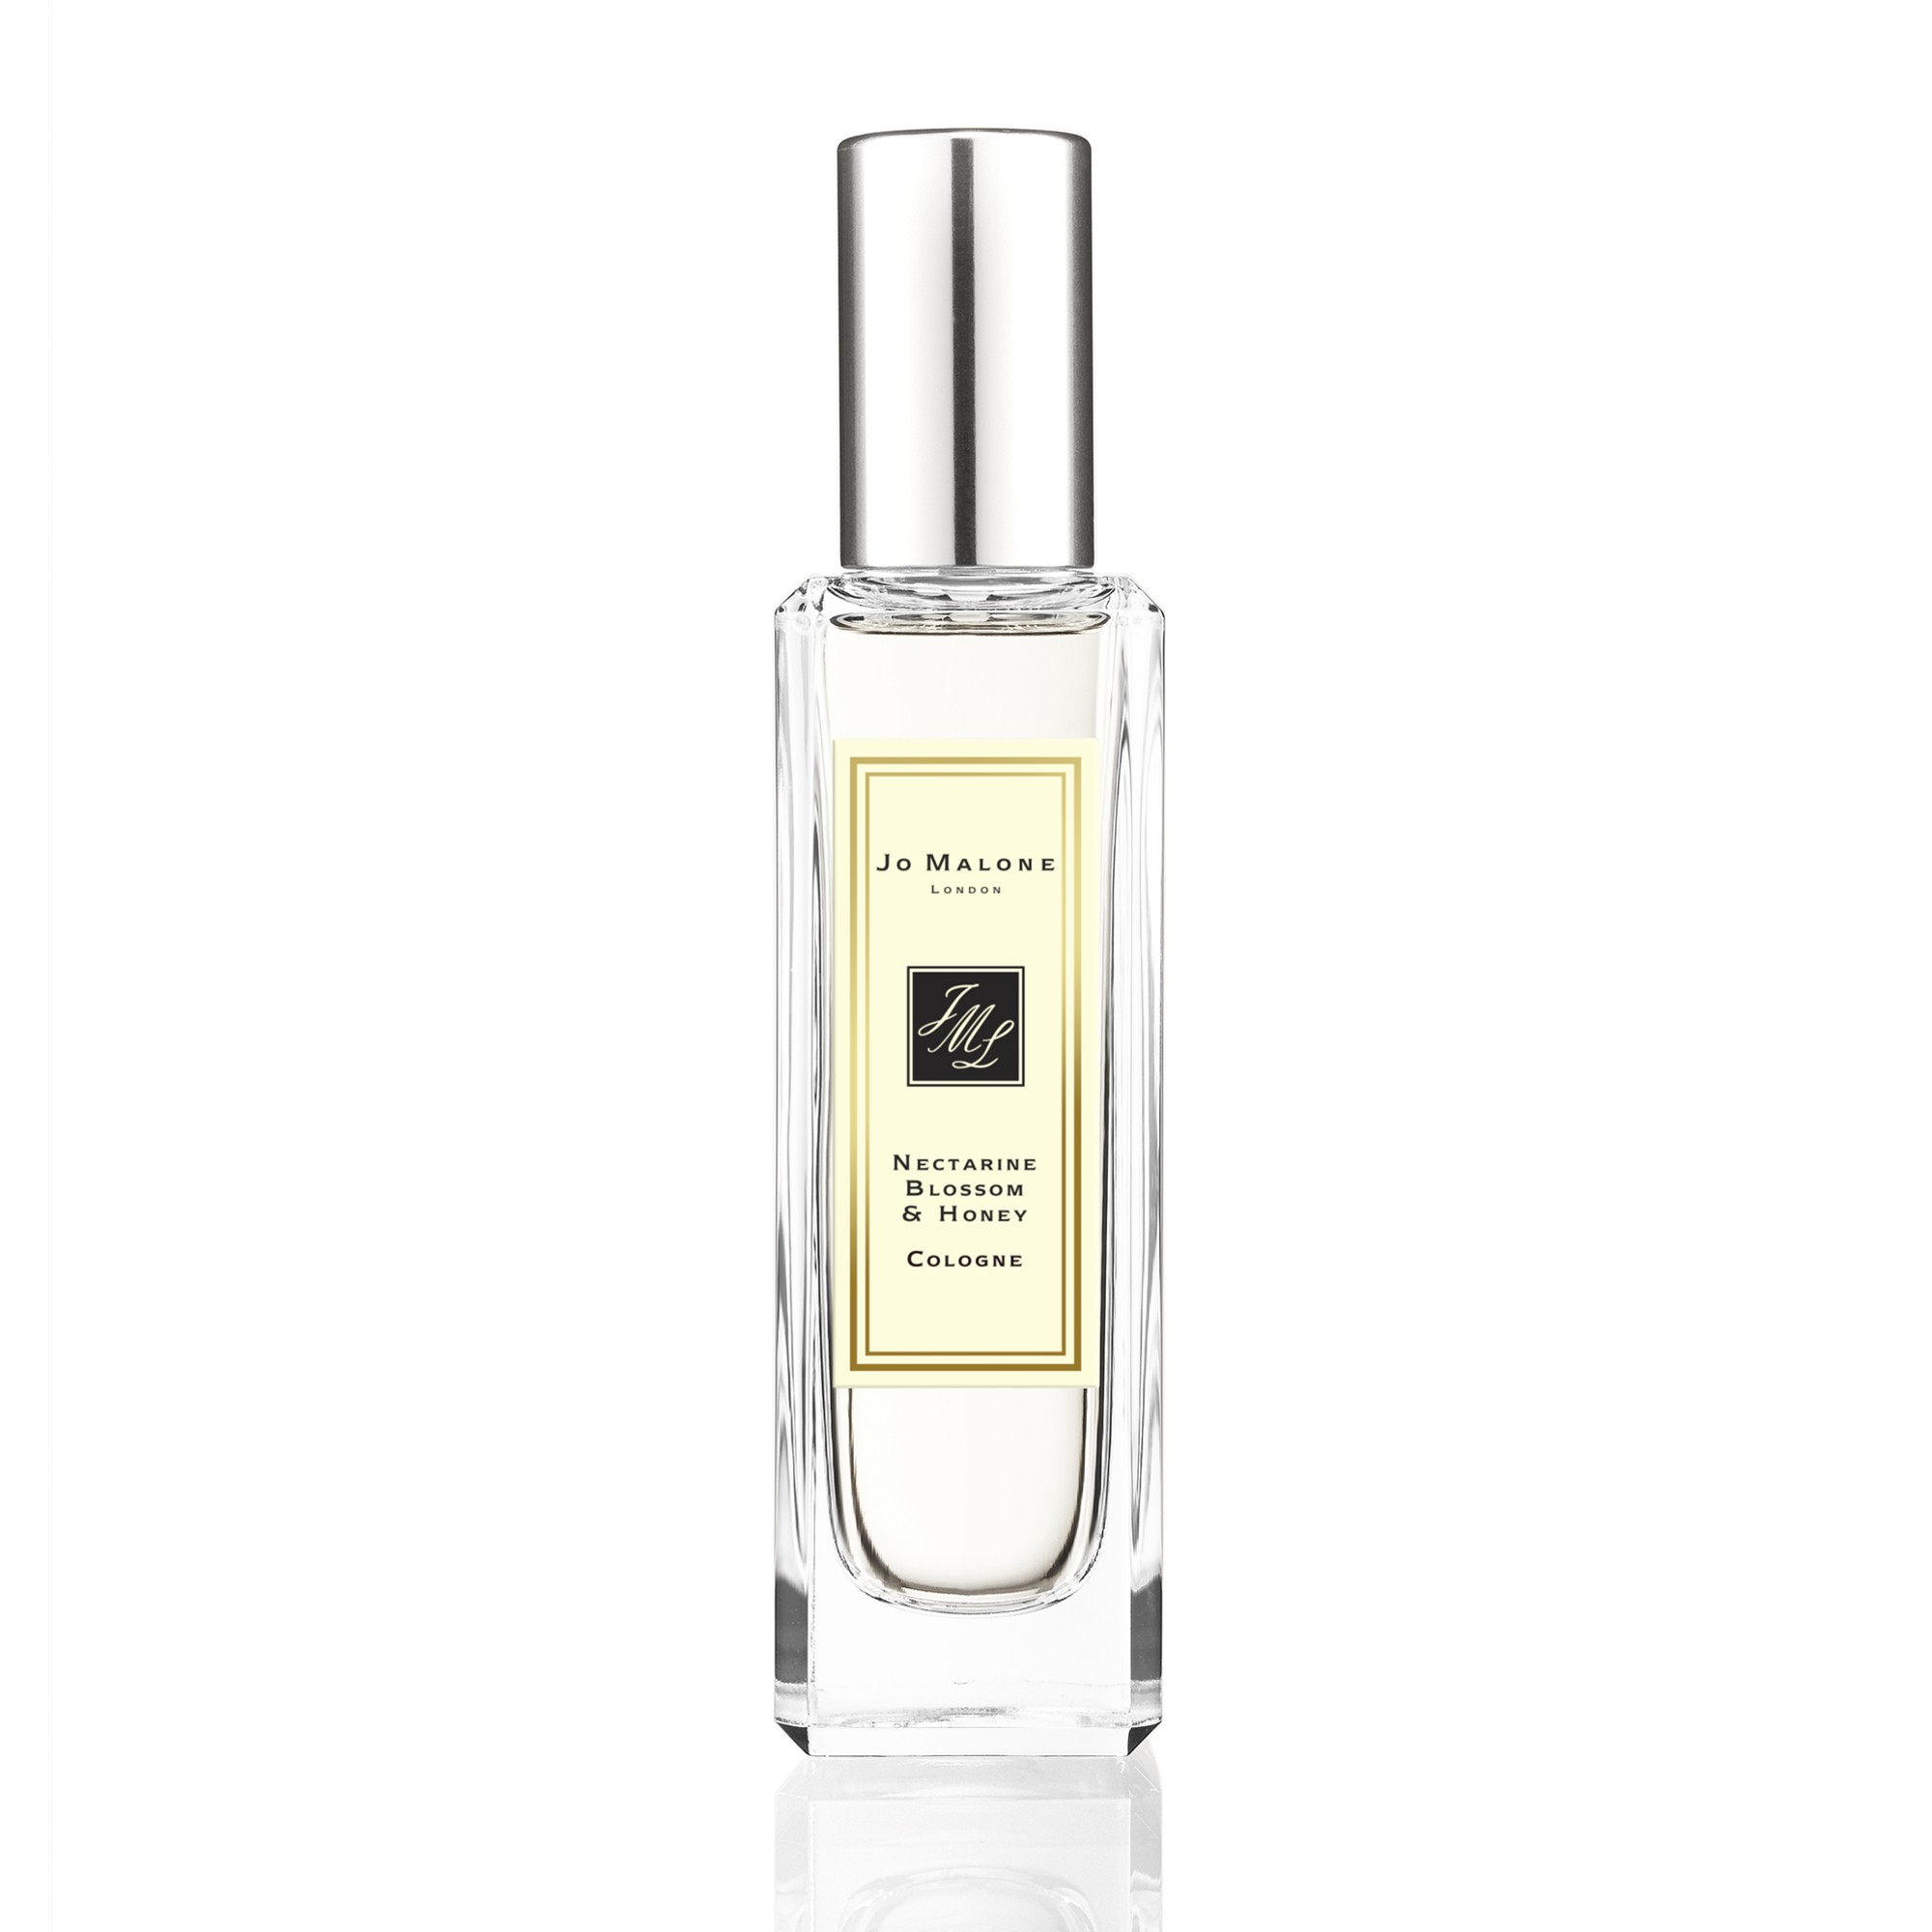 Jo Malone London 'Nectarine Blossom & Honey ขนาด 30ml พร้อมกล่องสวยหรู